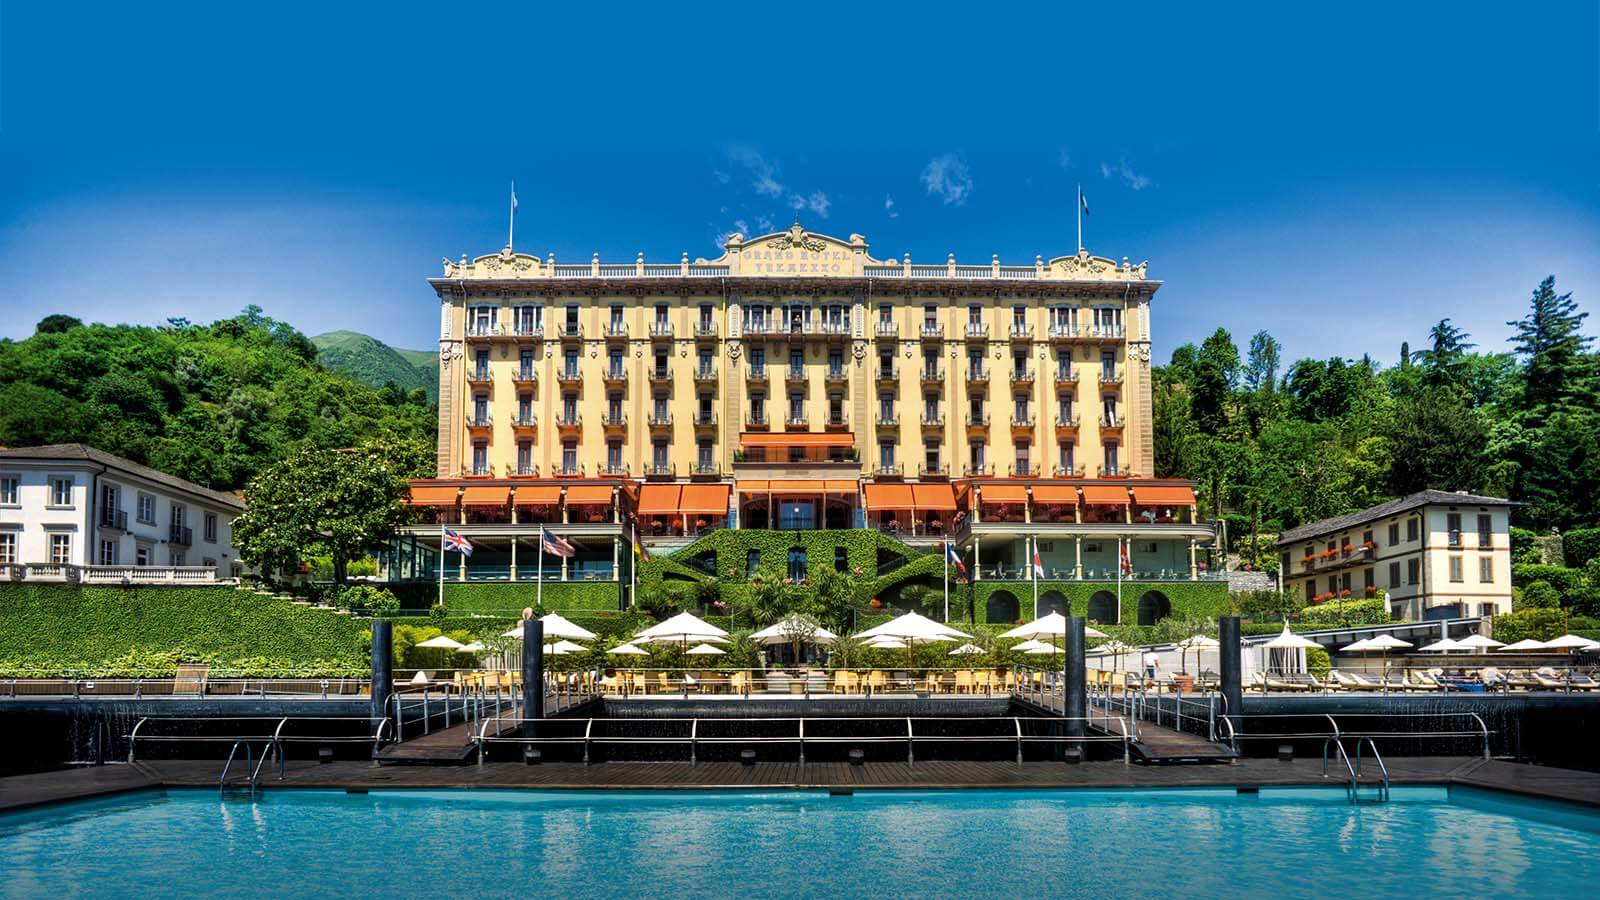 Exterior daytime of the Grand Hotel Tremezzo in Lake Como, Italy.